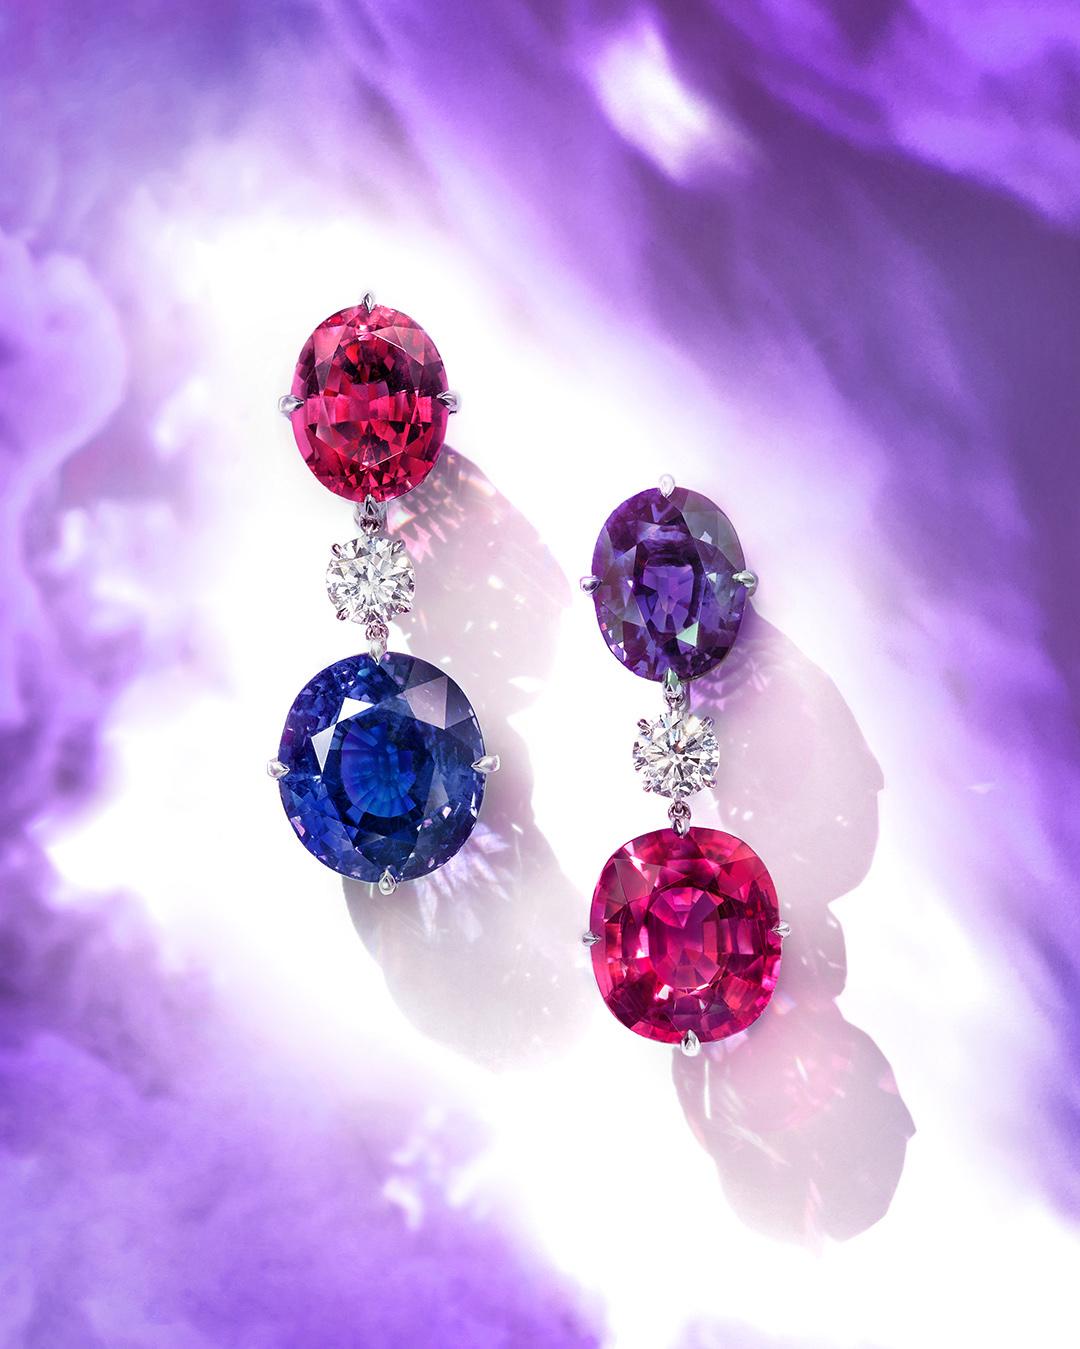 shoot-studio-london-jewellery-photography-boghossian-social-content-earrings-macro